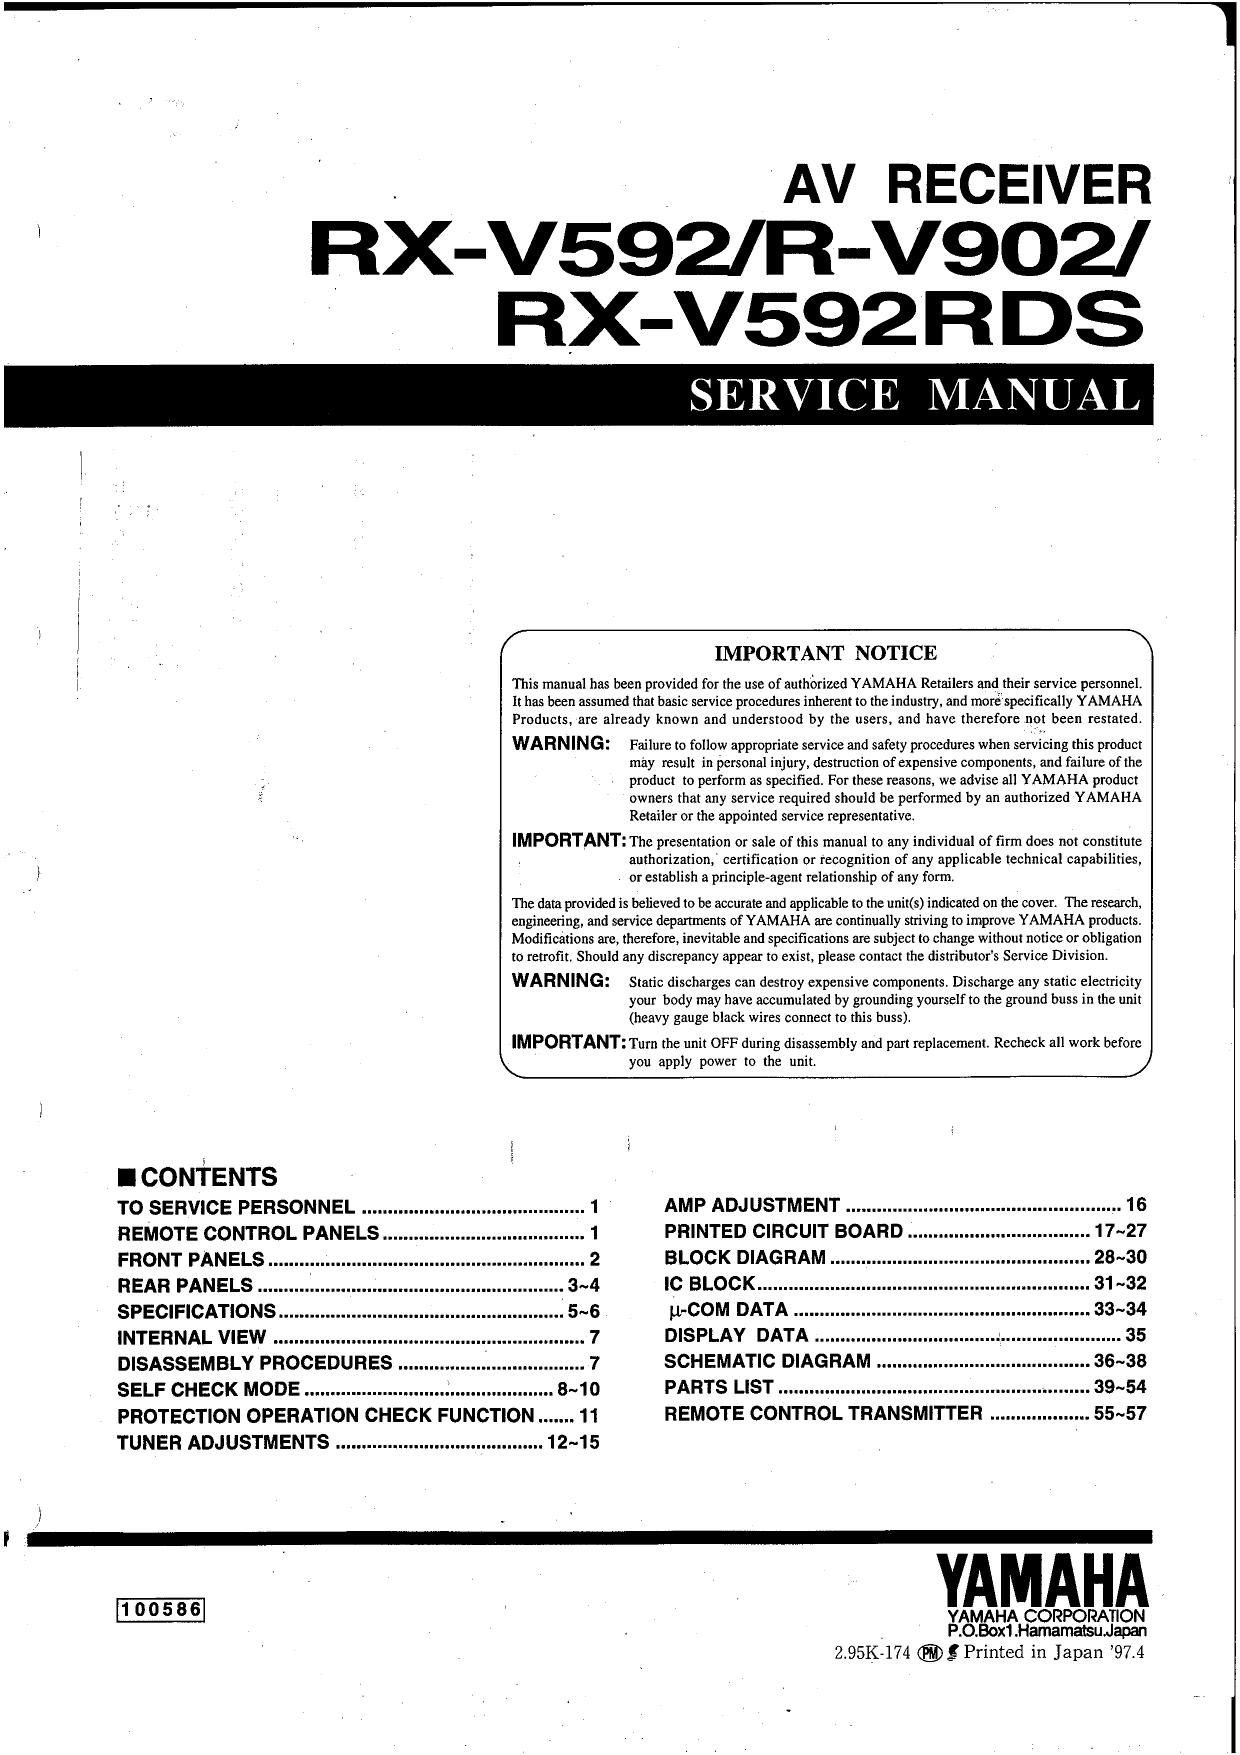 download free pdf for yamaha r v902 receiver manual rh umlib com Yamaha R6 Yamaha YZF-R1